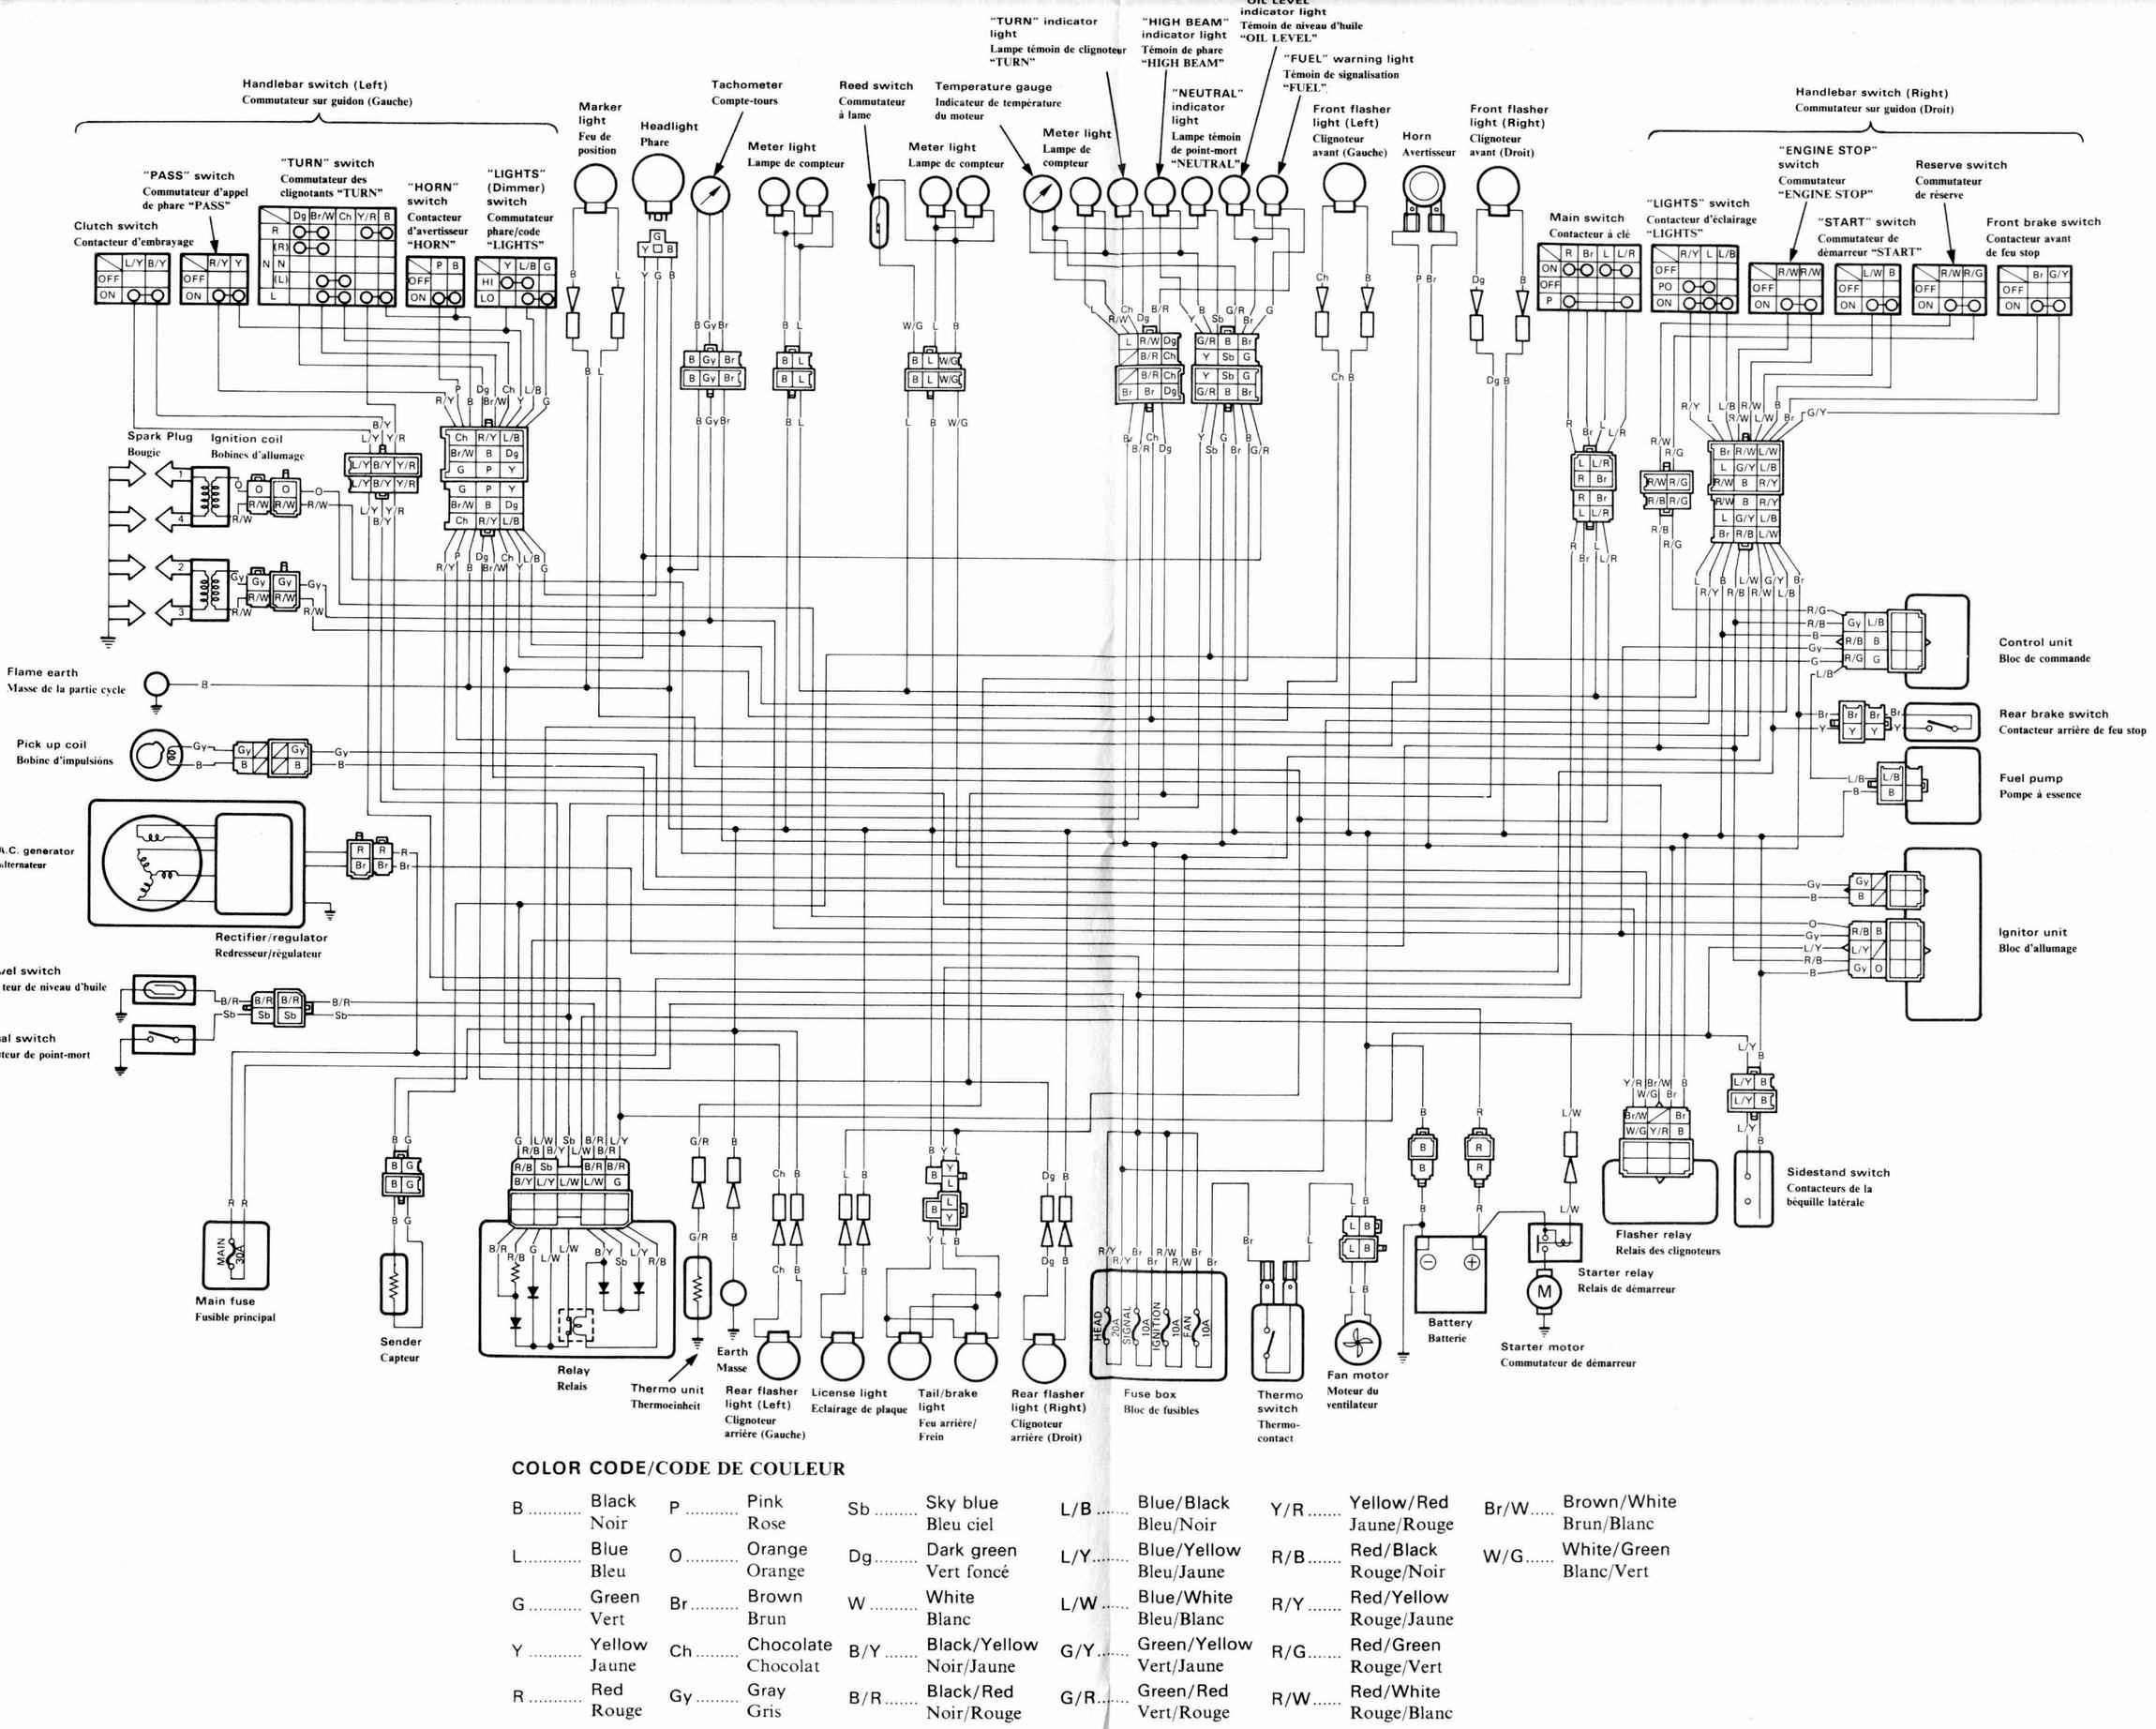 1fzx_3_00_fazertechstuff_09?resize=242258 yamaha fzr 600 wiring diagram 1999 yamaha grizzly 600 wiring